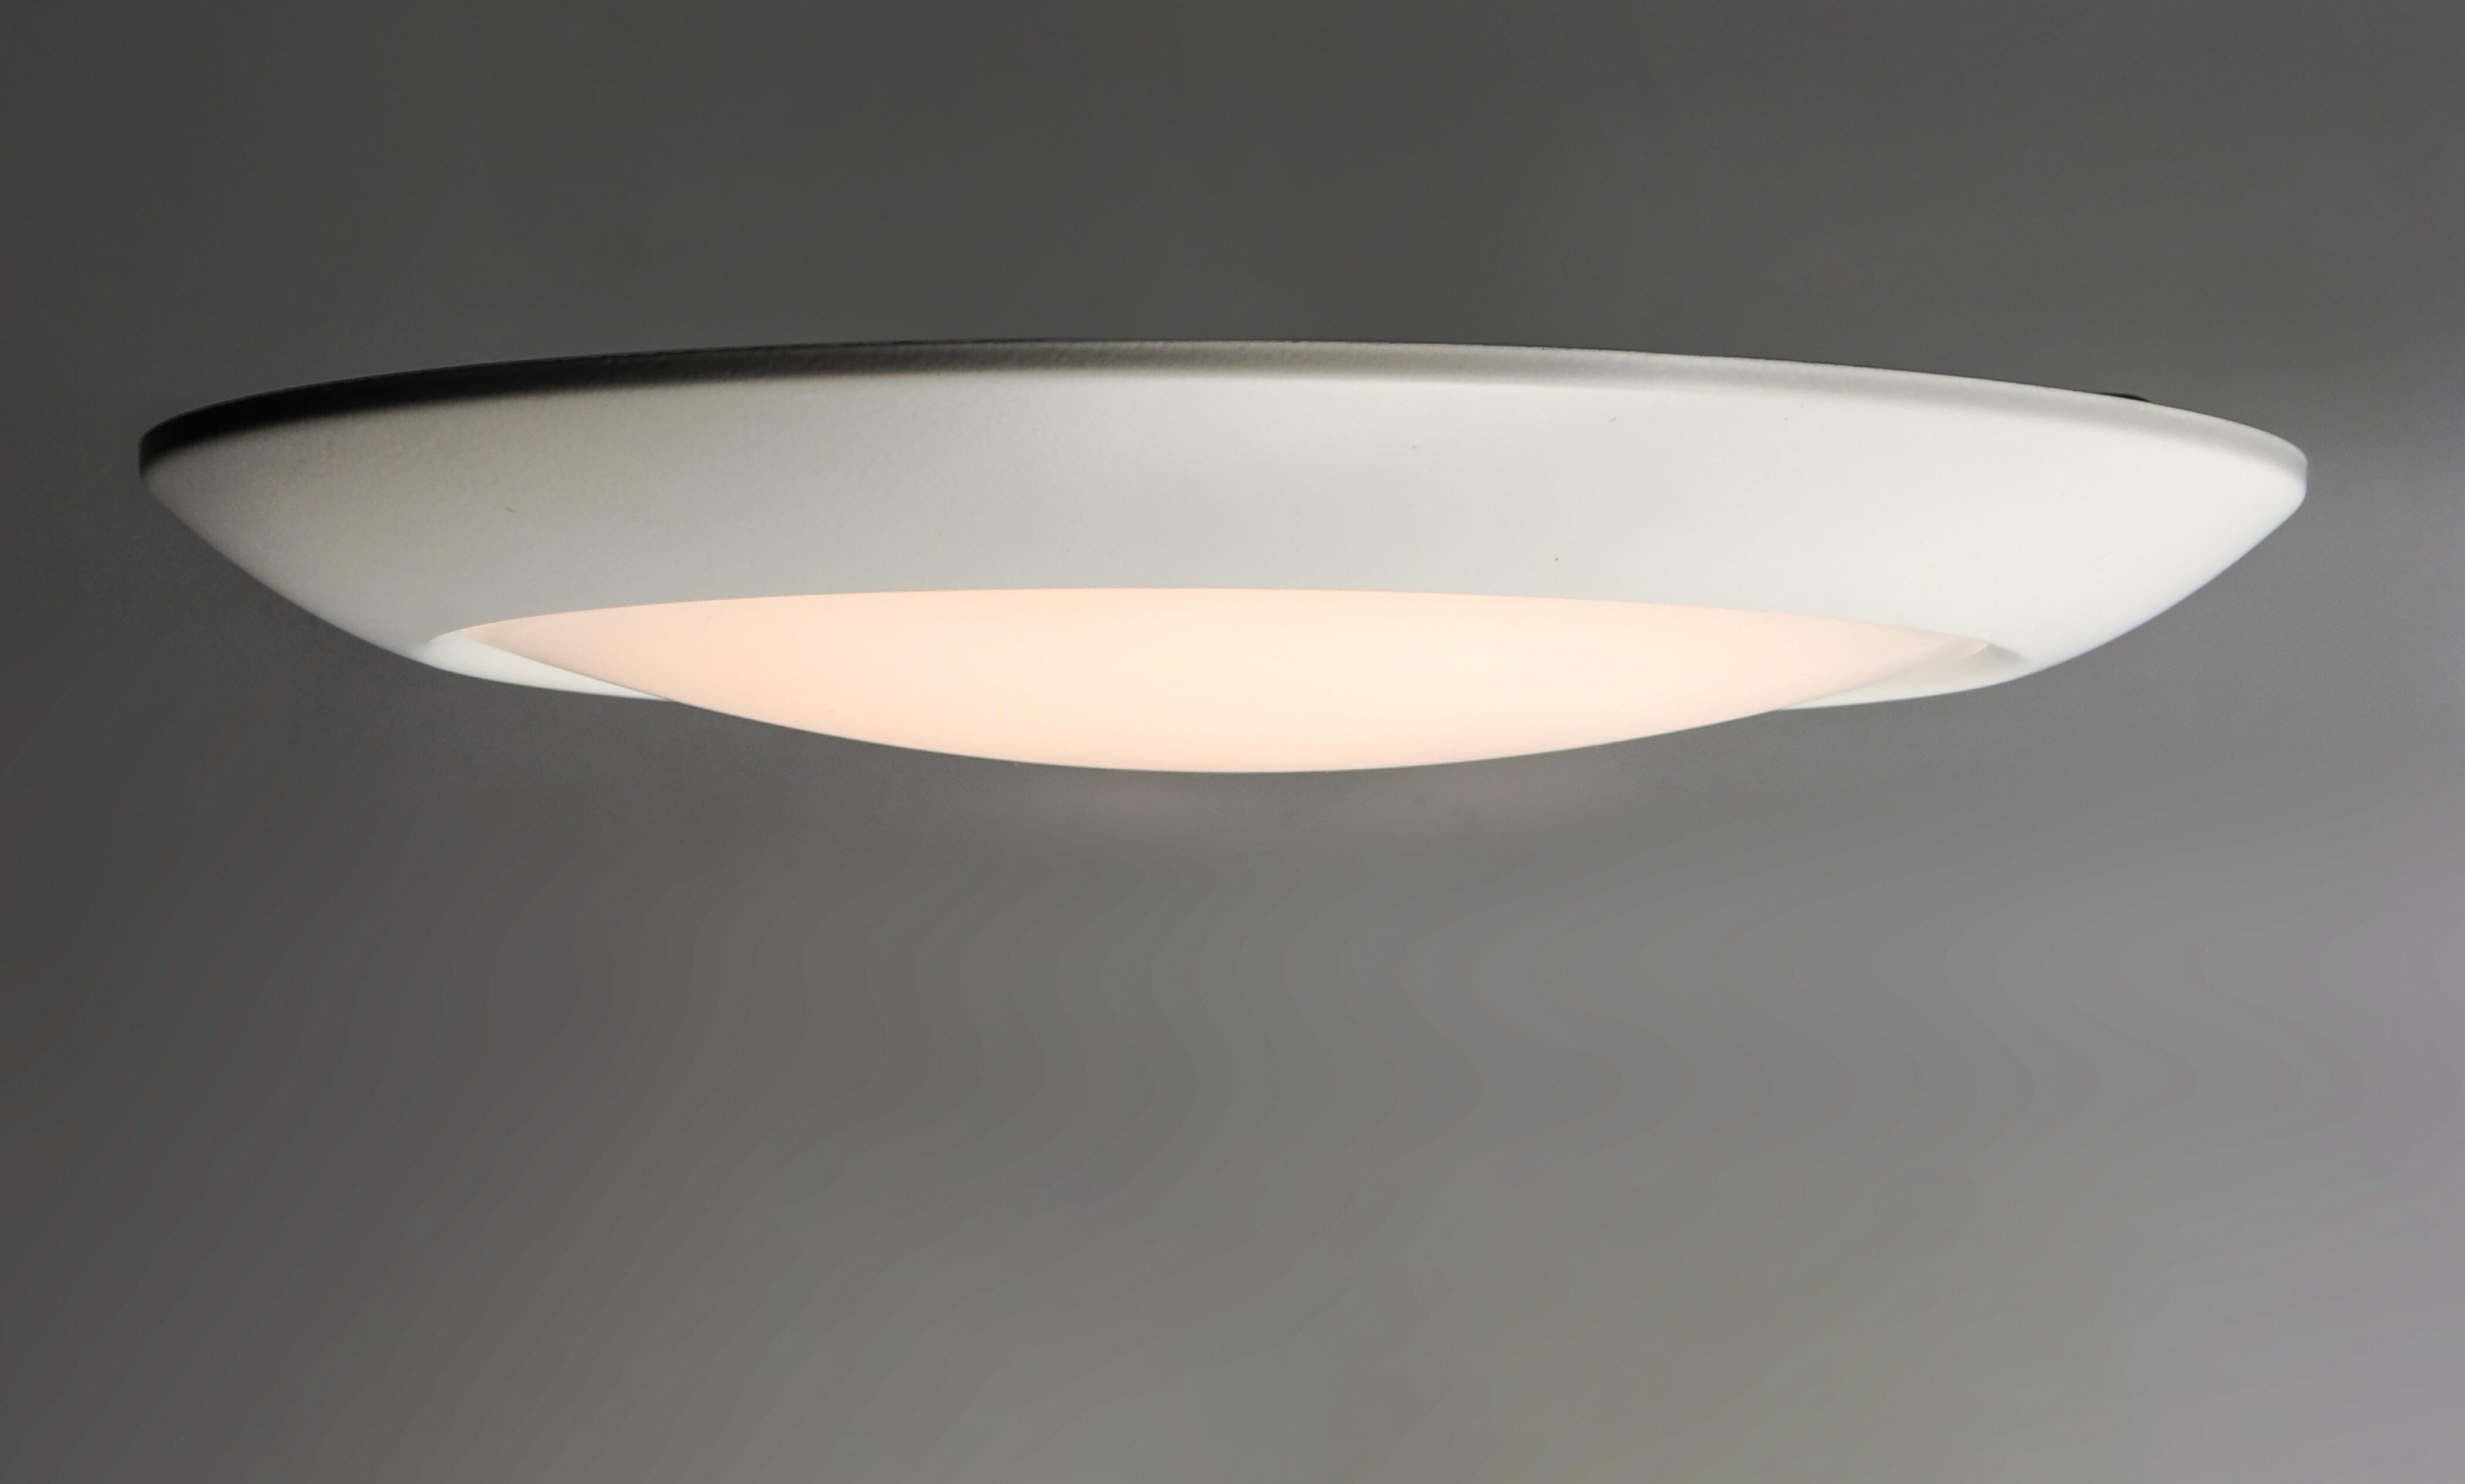 Ebern Designs Lospalmos 1 Light 13 Simple Circle Led Flush Mount Wayfair